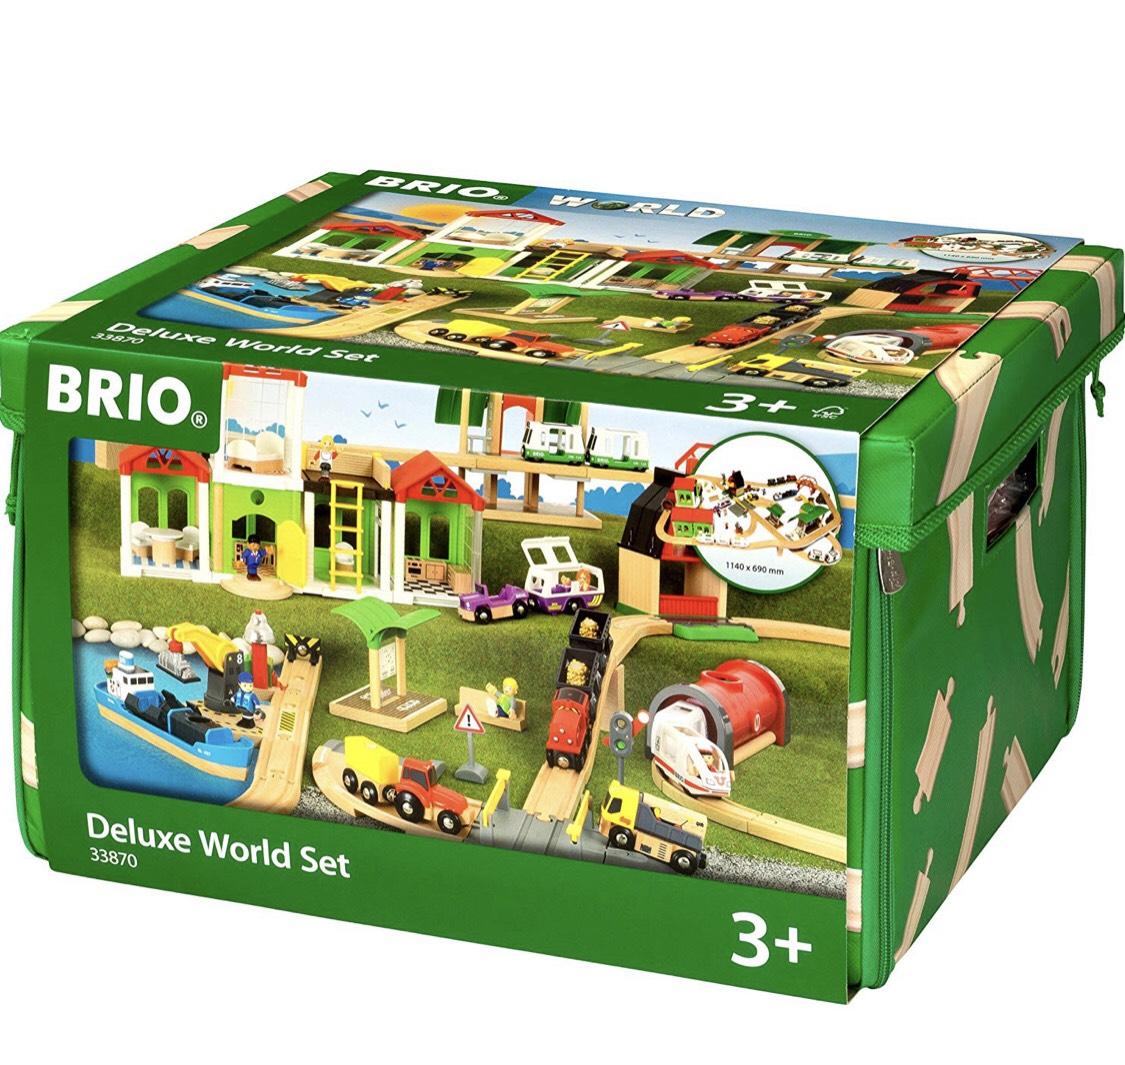 BRIO - World Set Deluxe 33870